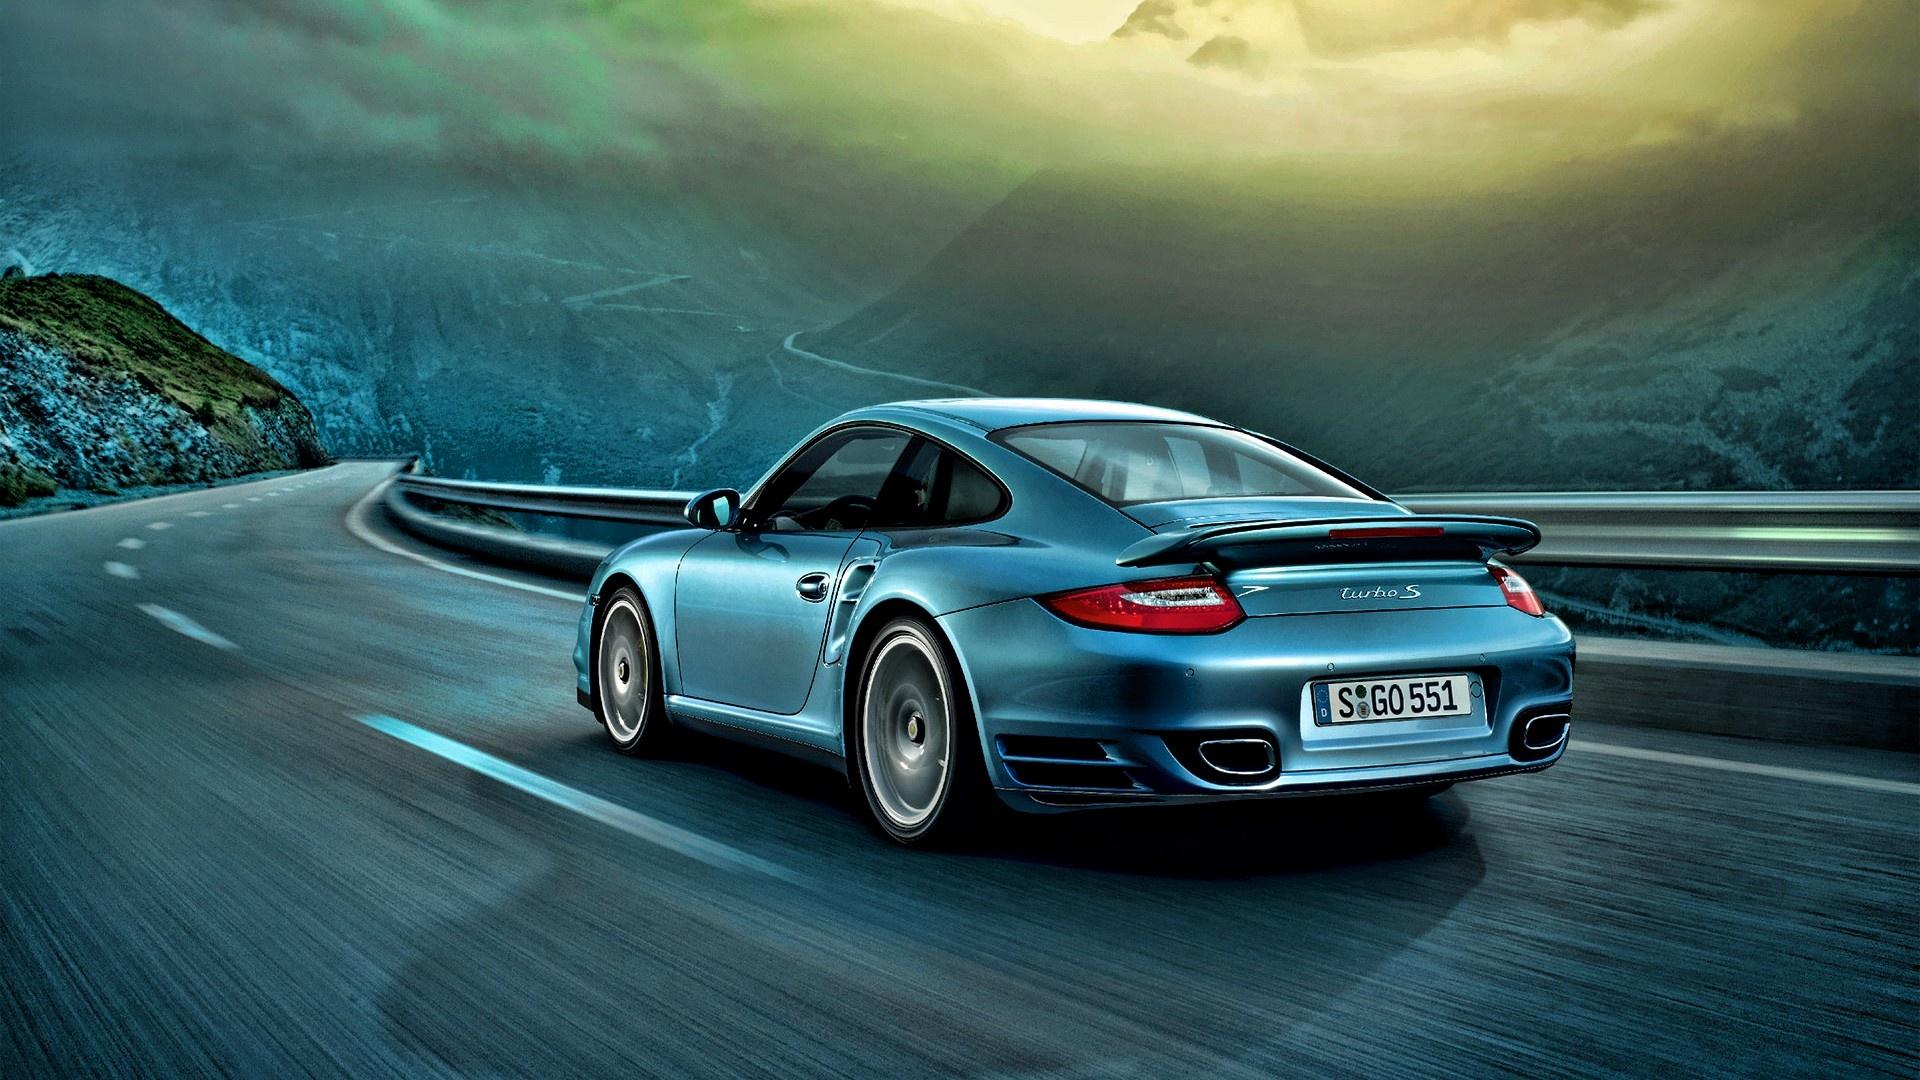 49 Porsche 911 Turbo S Wallpaper On Wallpapersafari